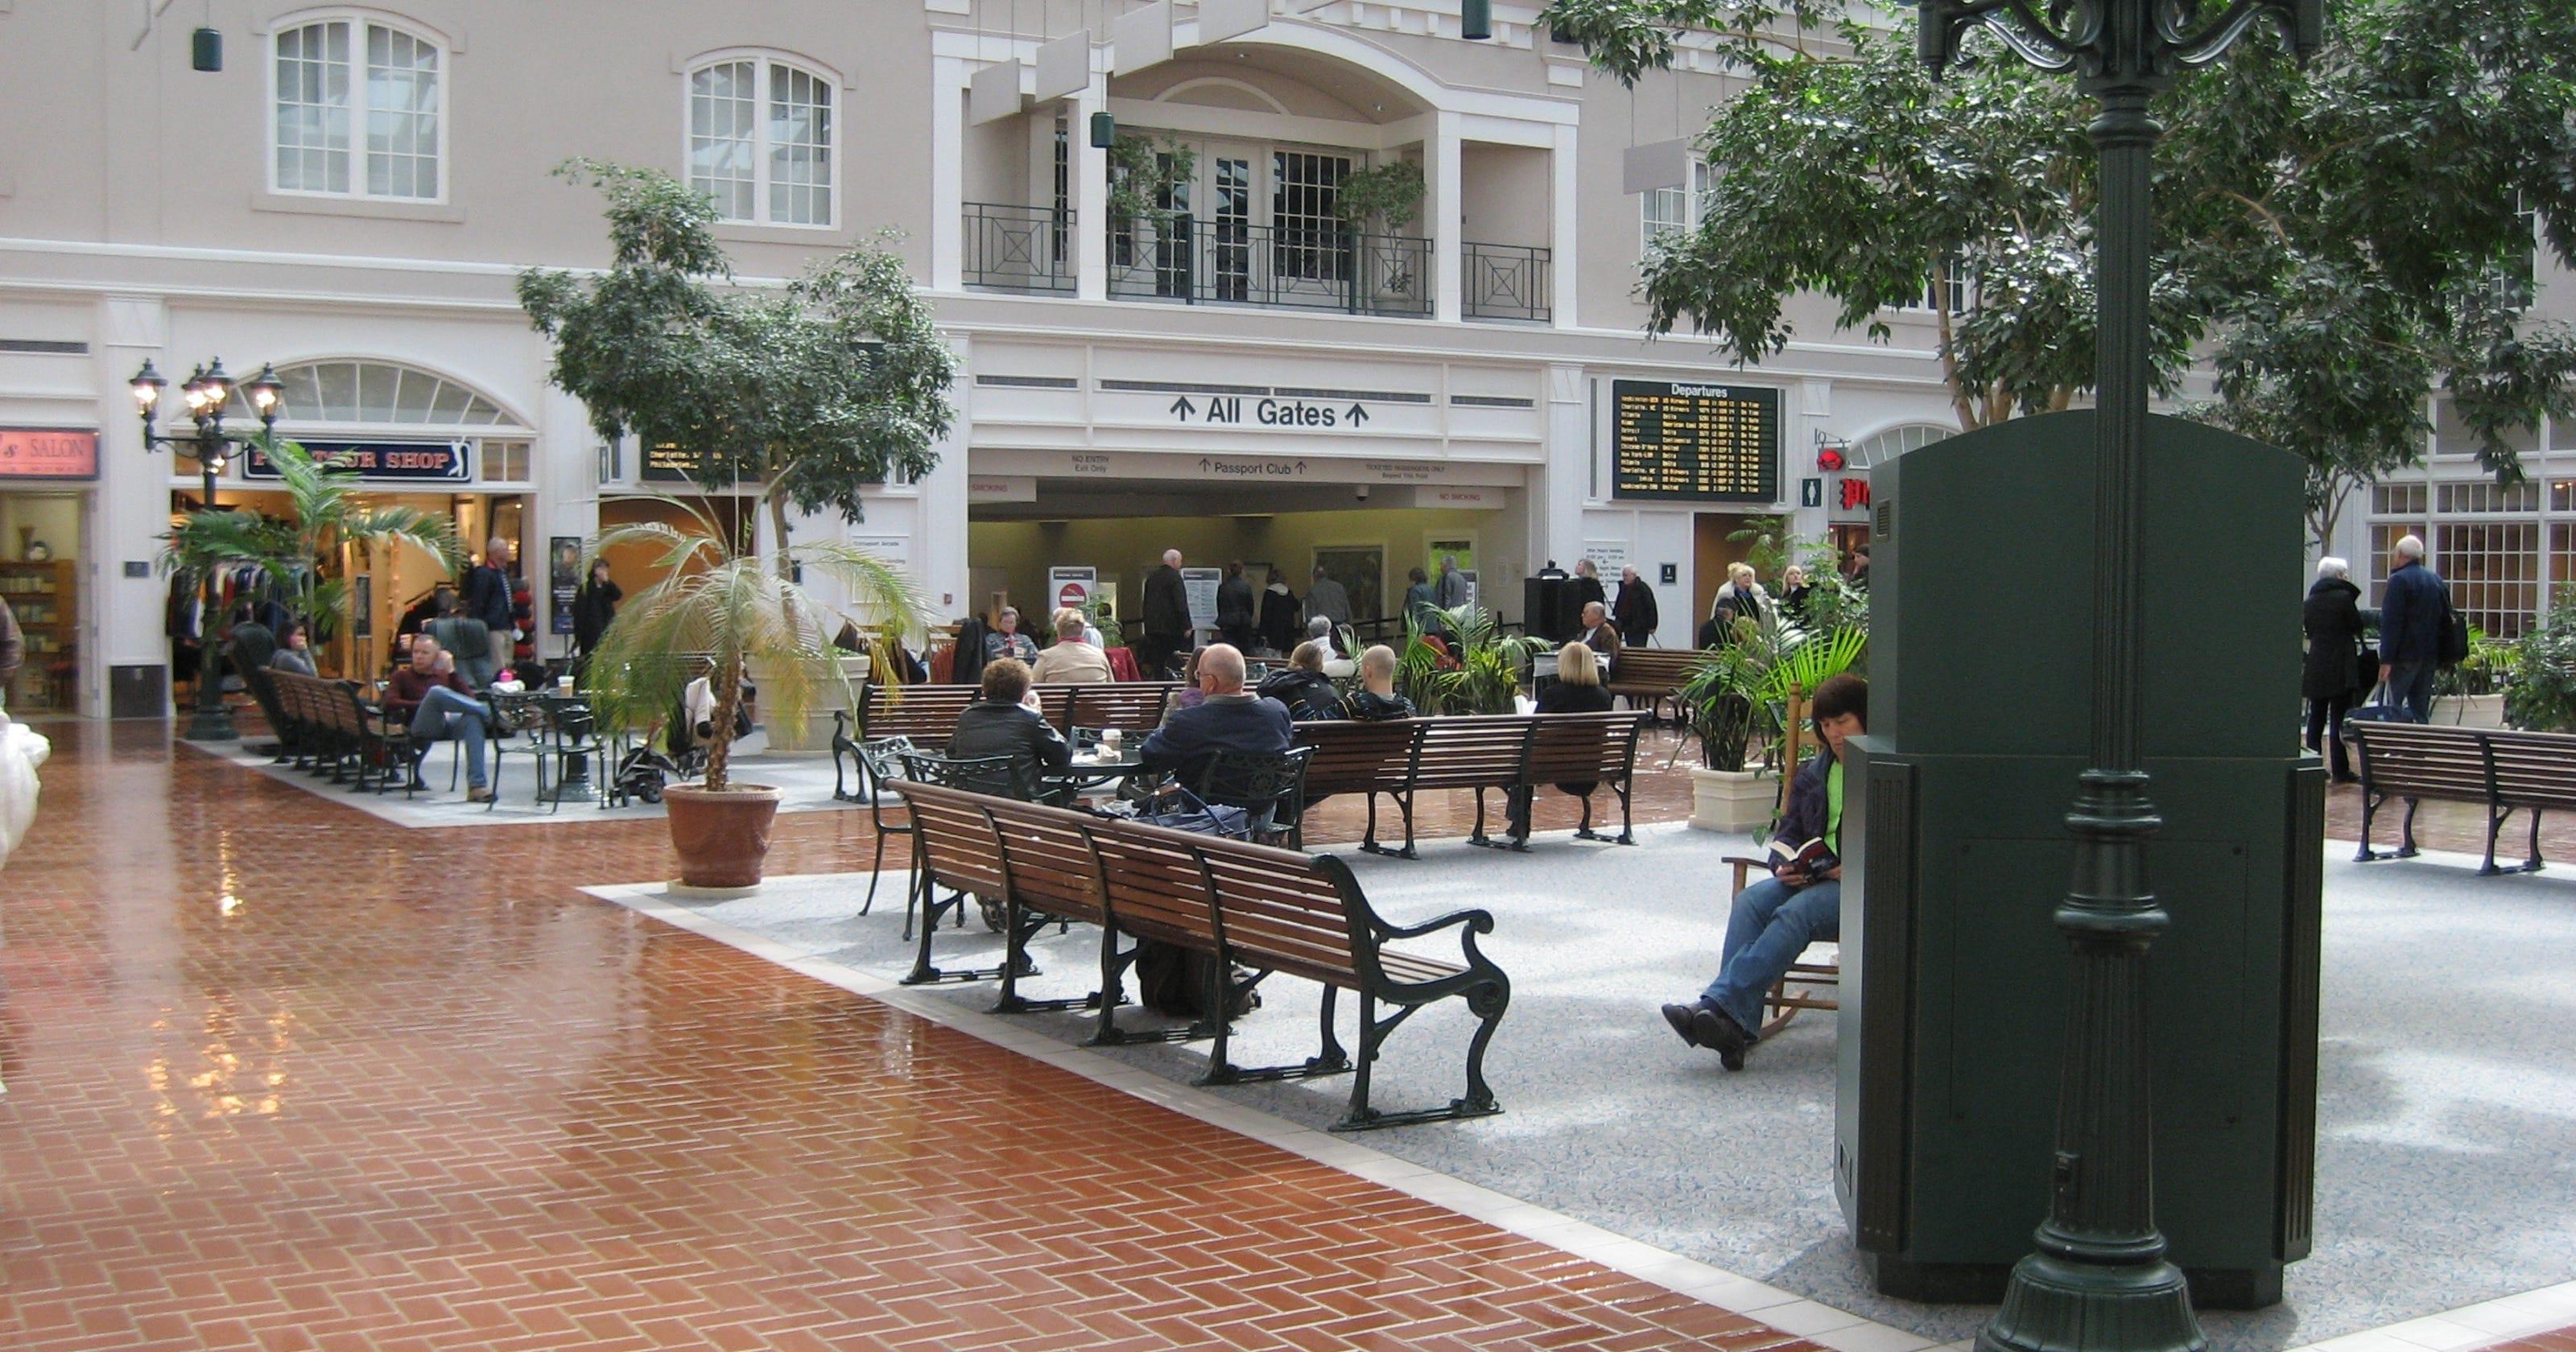 Savannah airport set for terminal apron expansion project